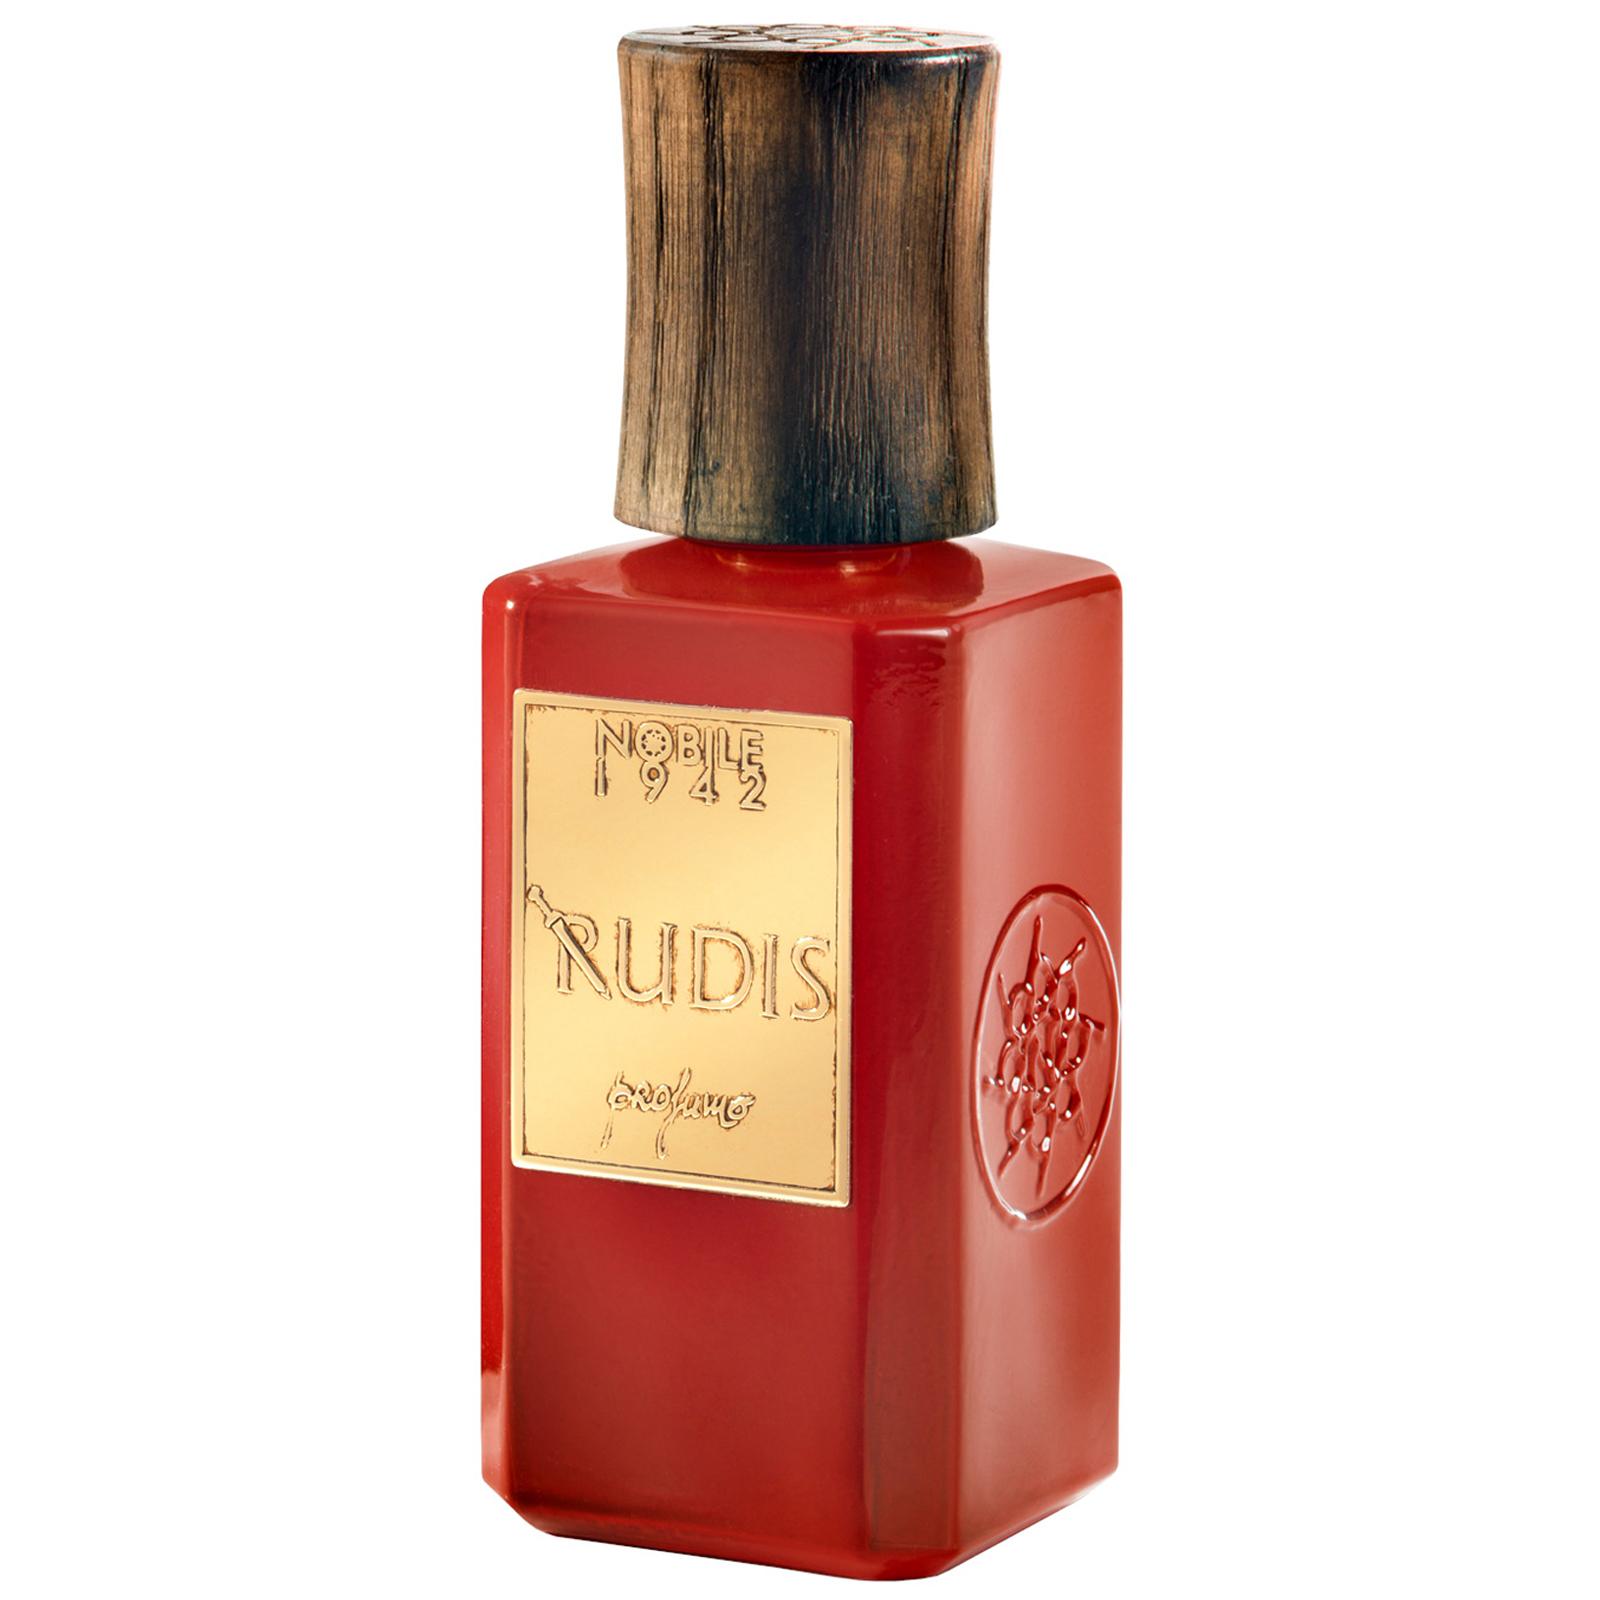 Rudis profumo parfum 75 ml